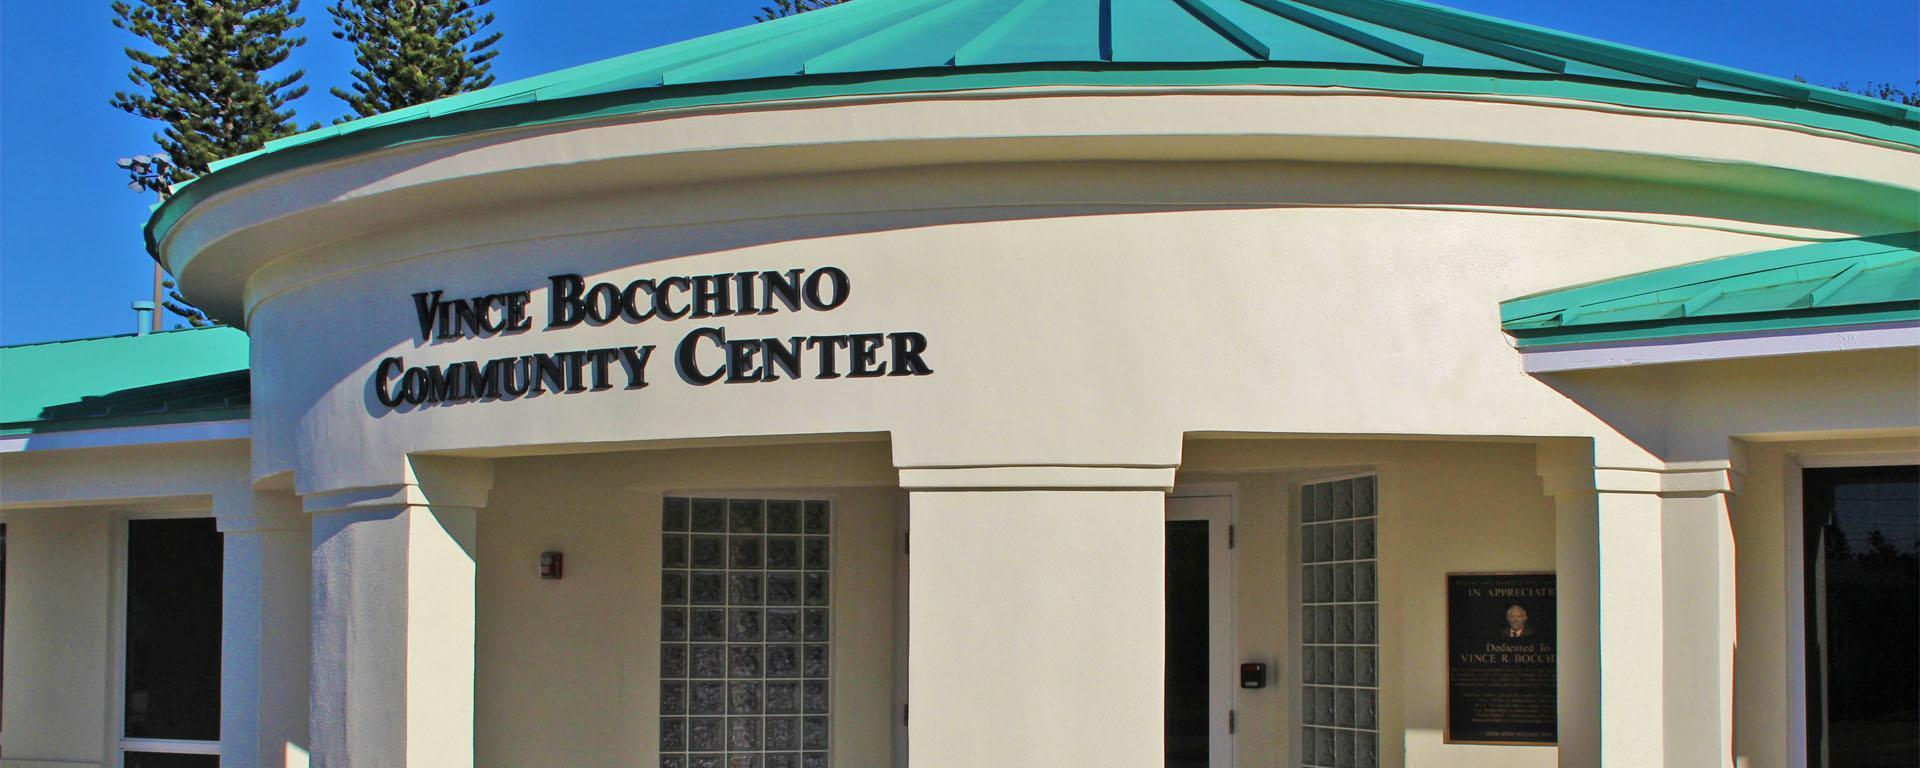 Vince Bocchino Community Center